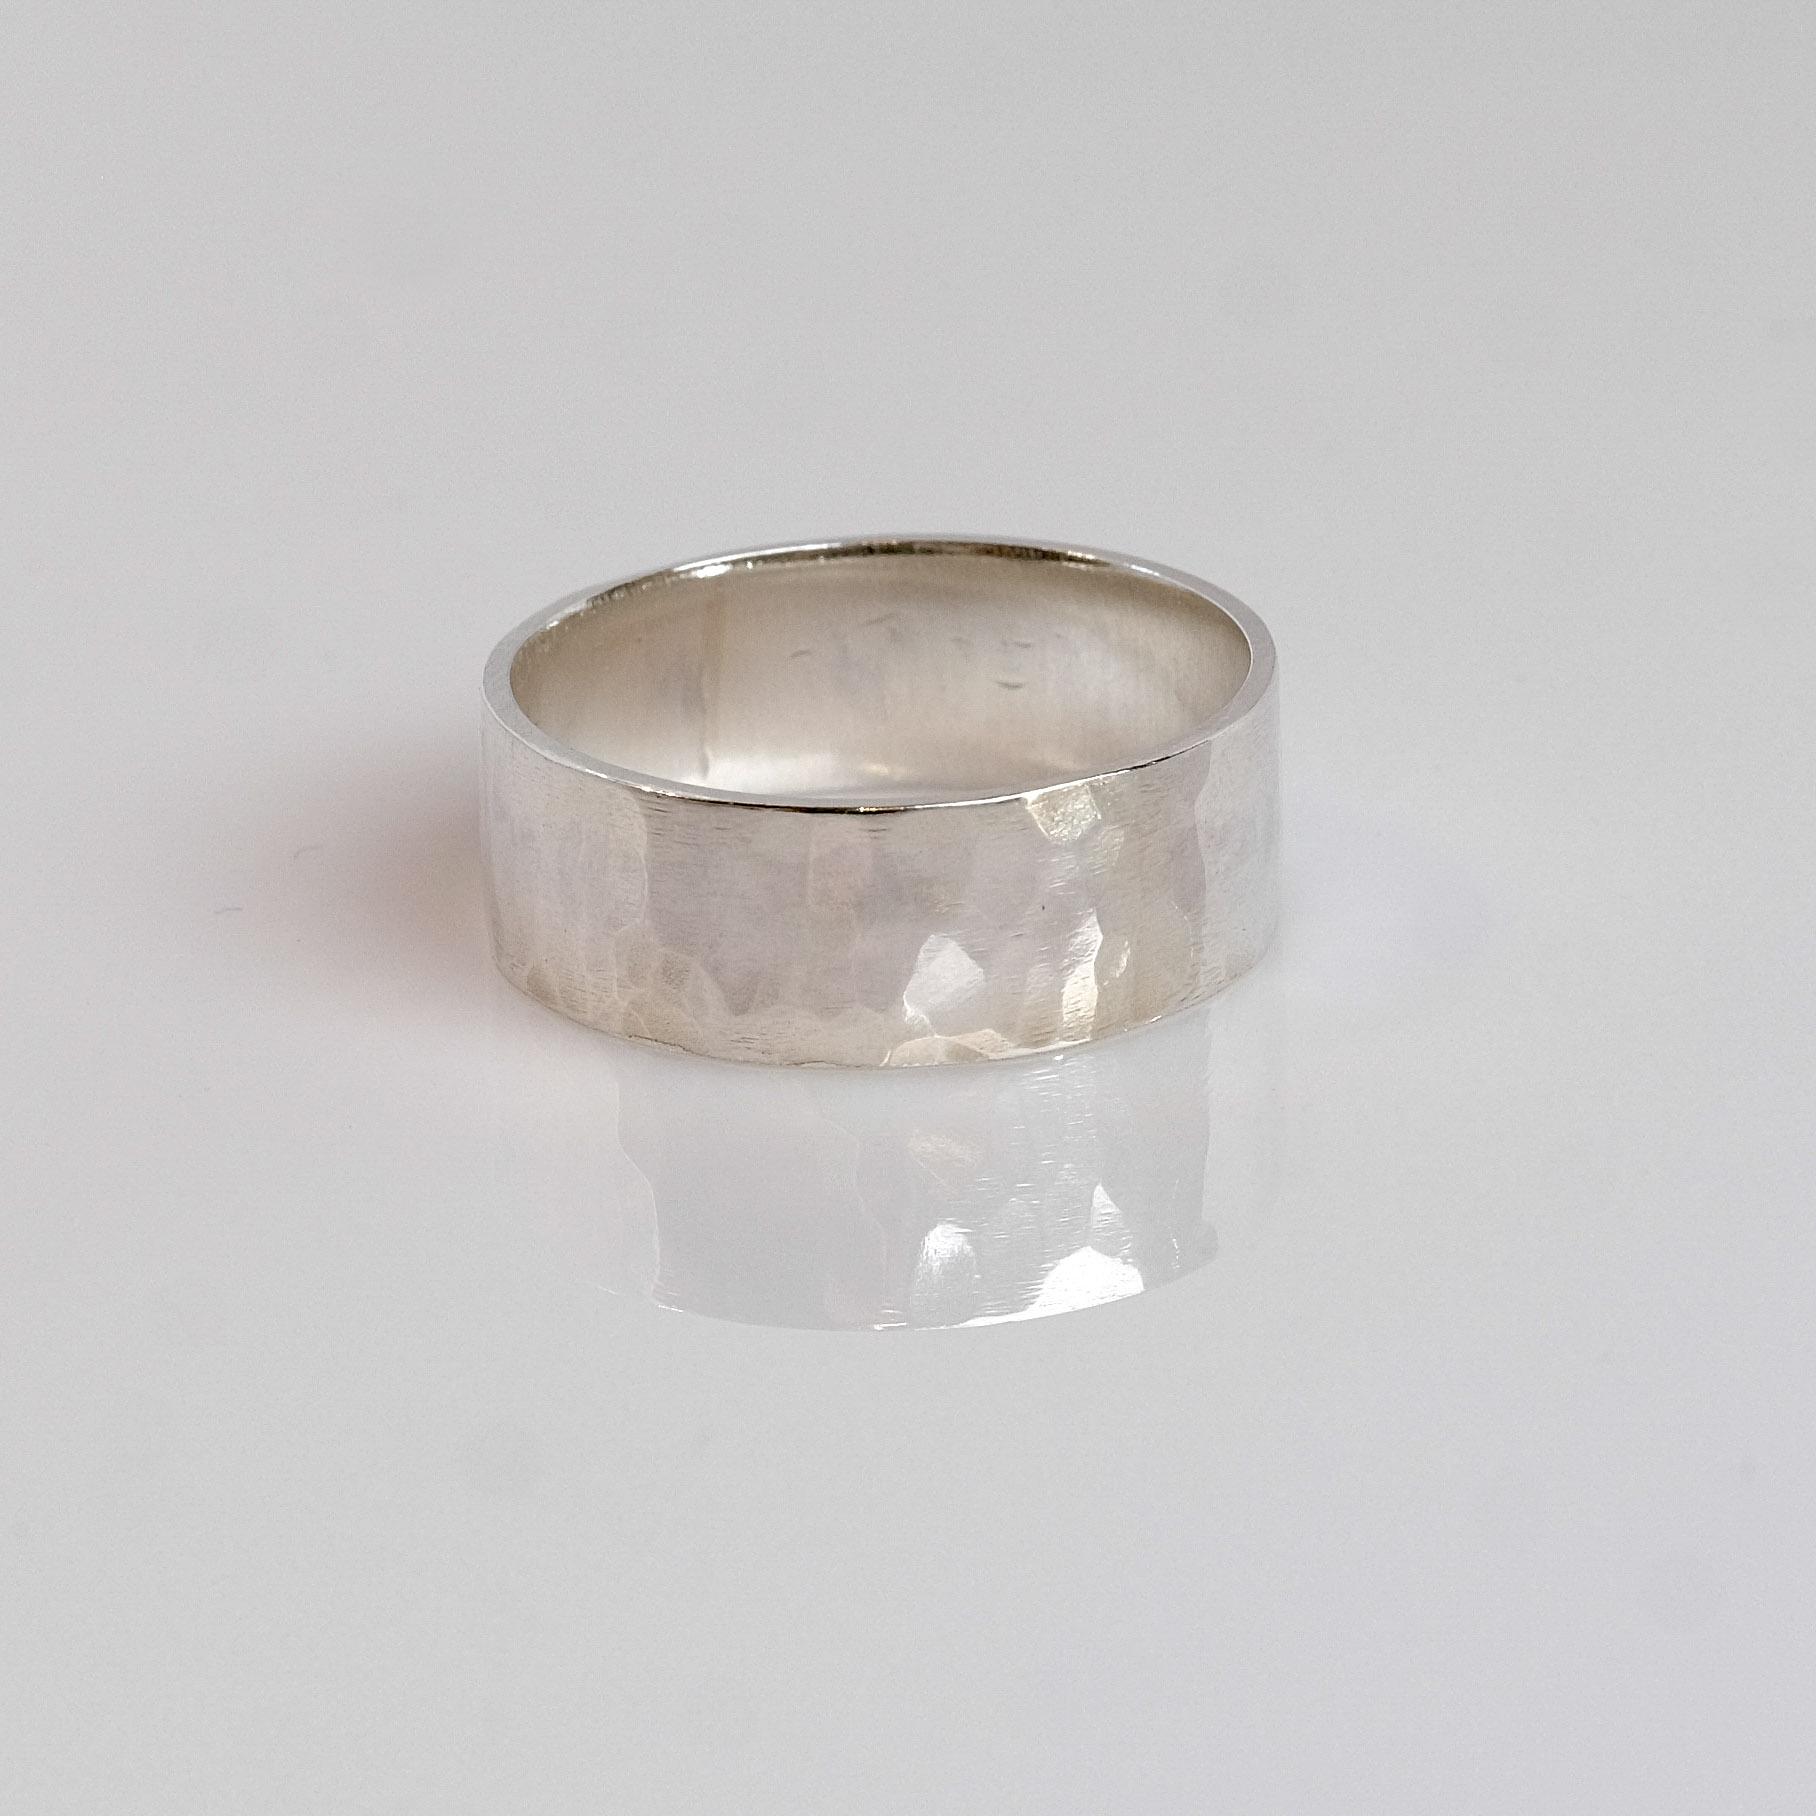 Pris: dkk: 850Hammerslået ring